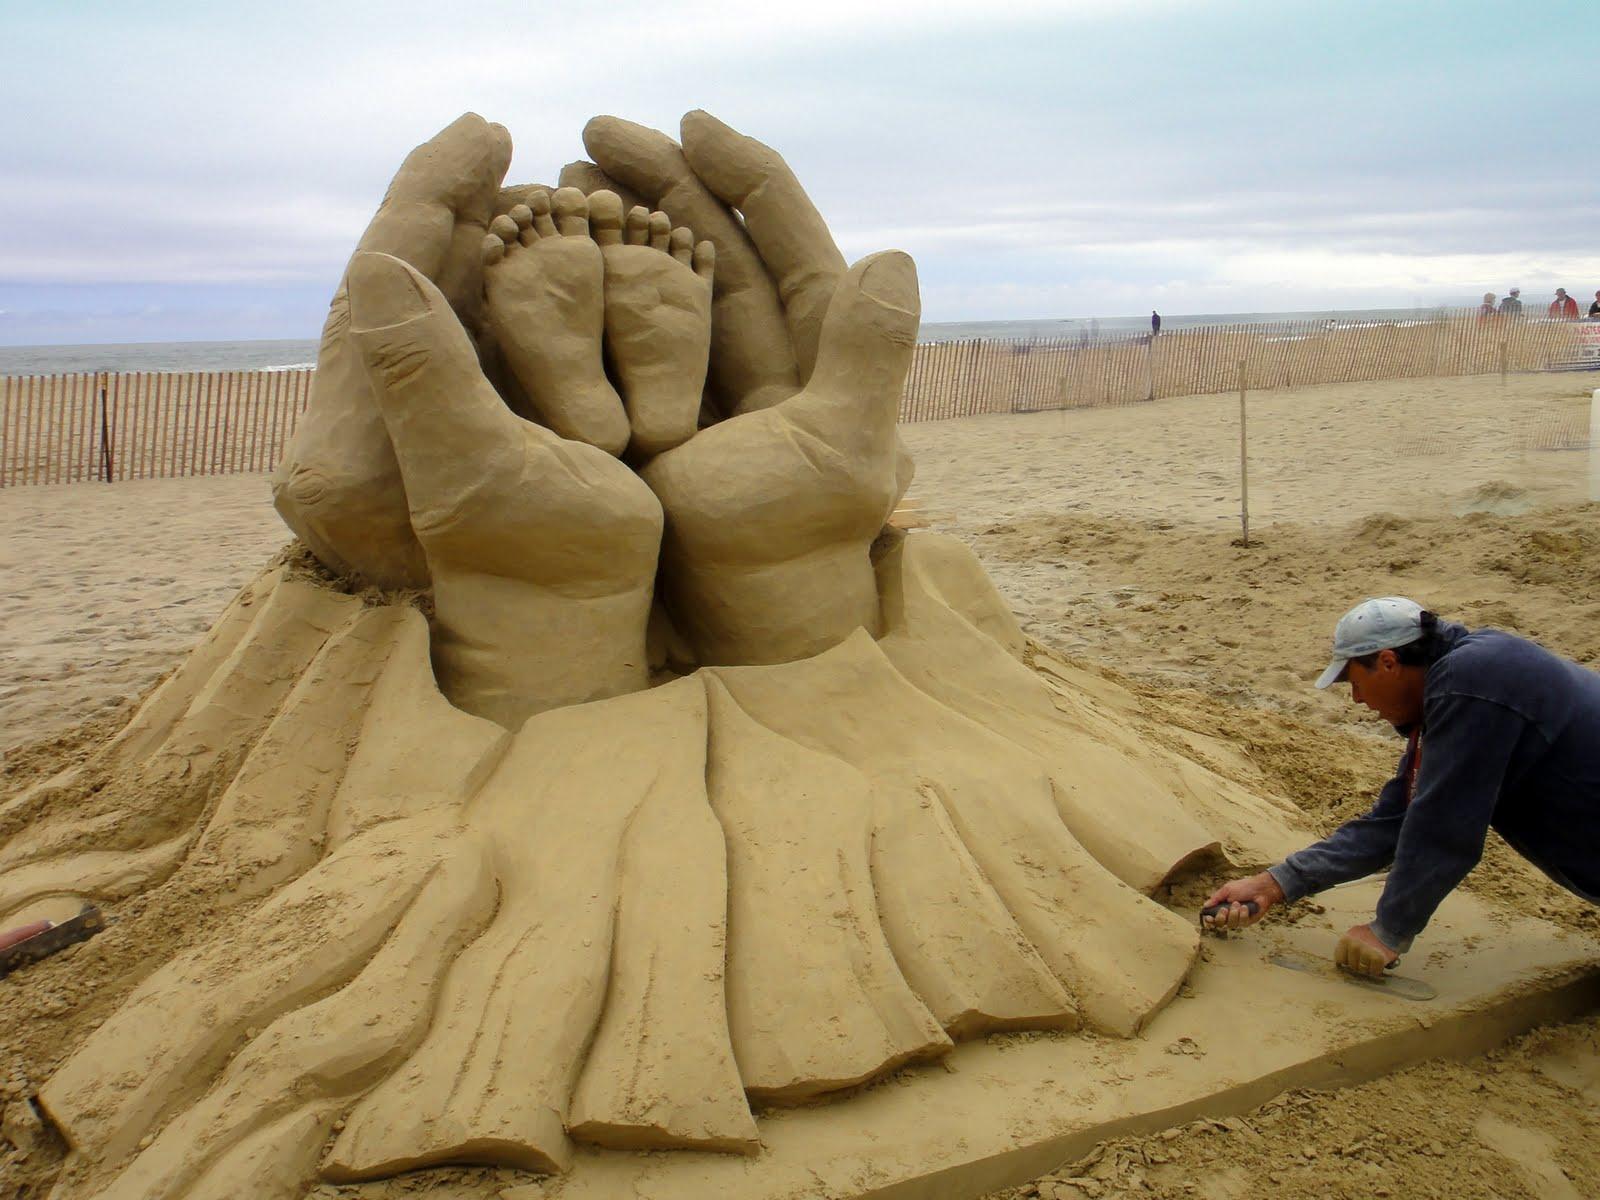 Joe S Retirement Blog Sand Sculpting Hampton Beach New Hampshire Usa